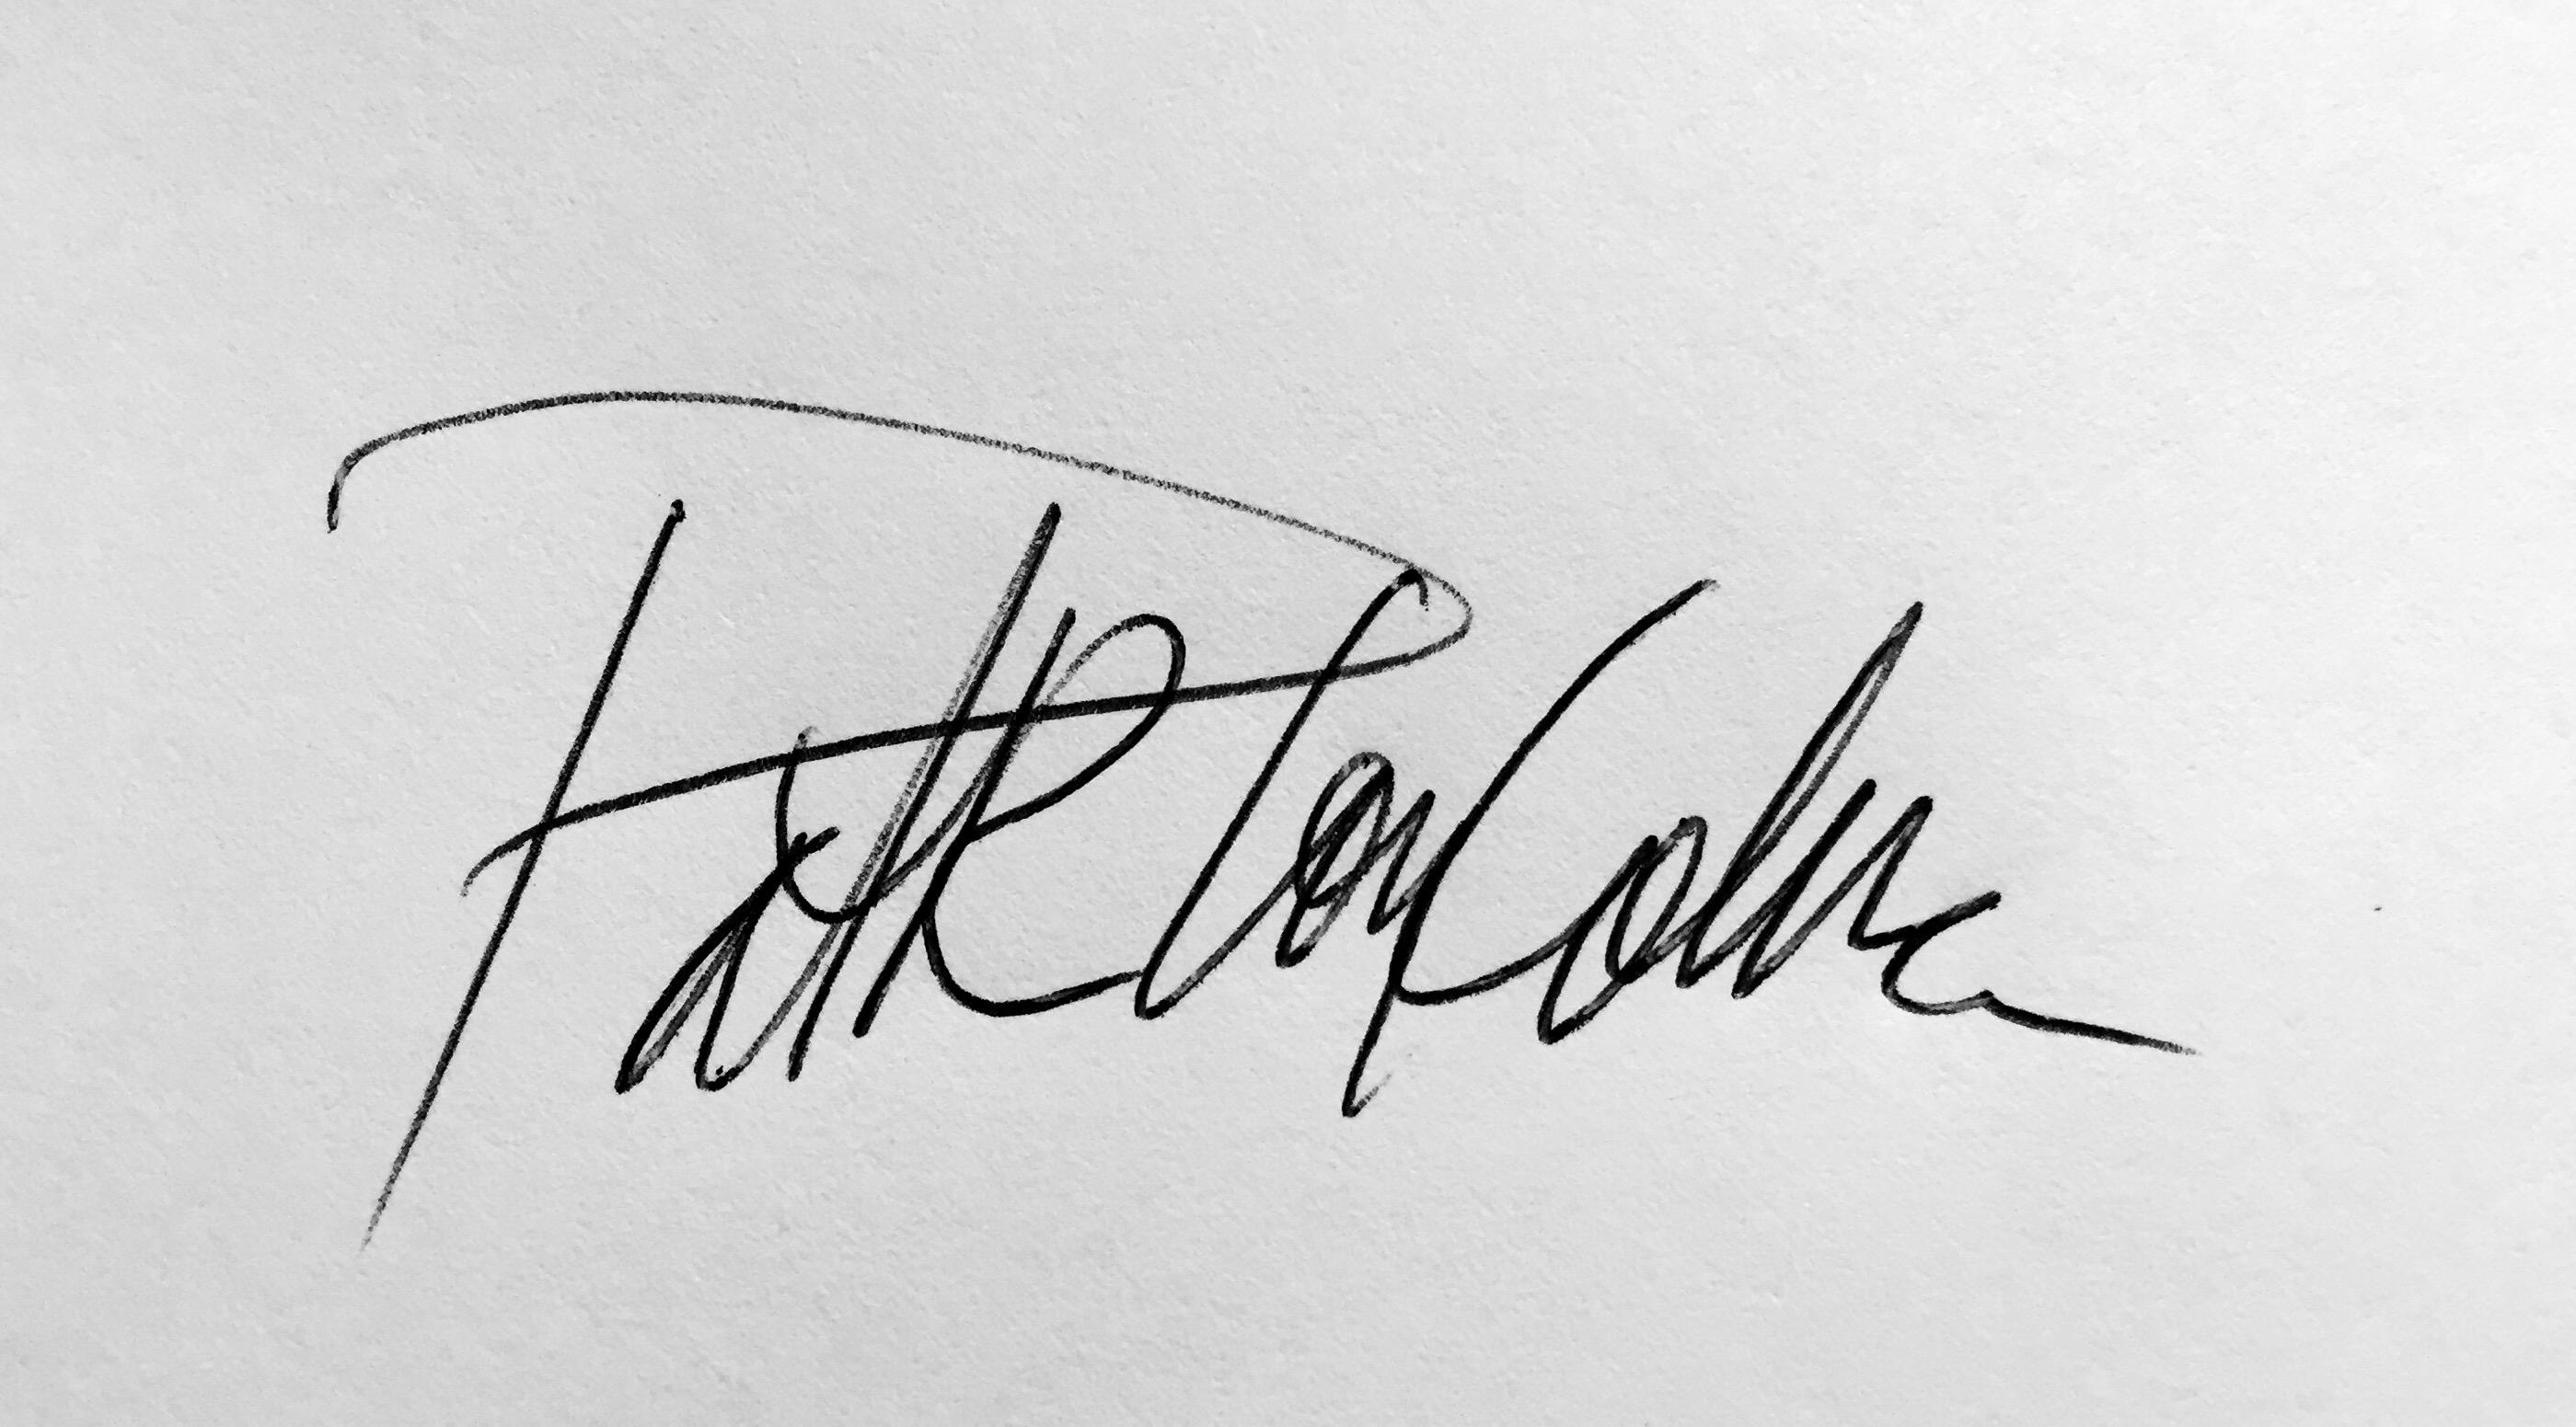 Patricia Loy-Colebank's Signature